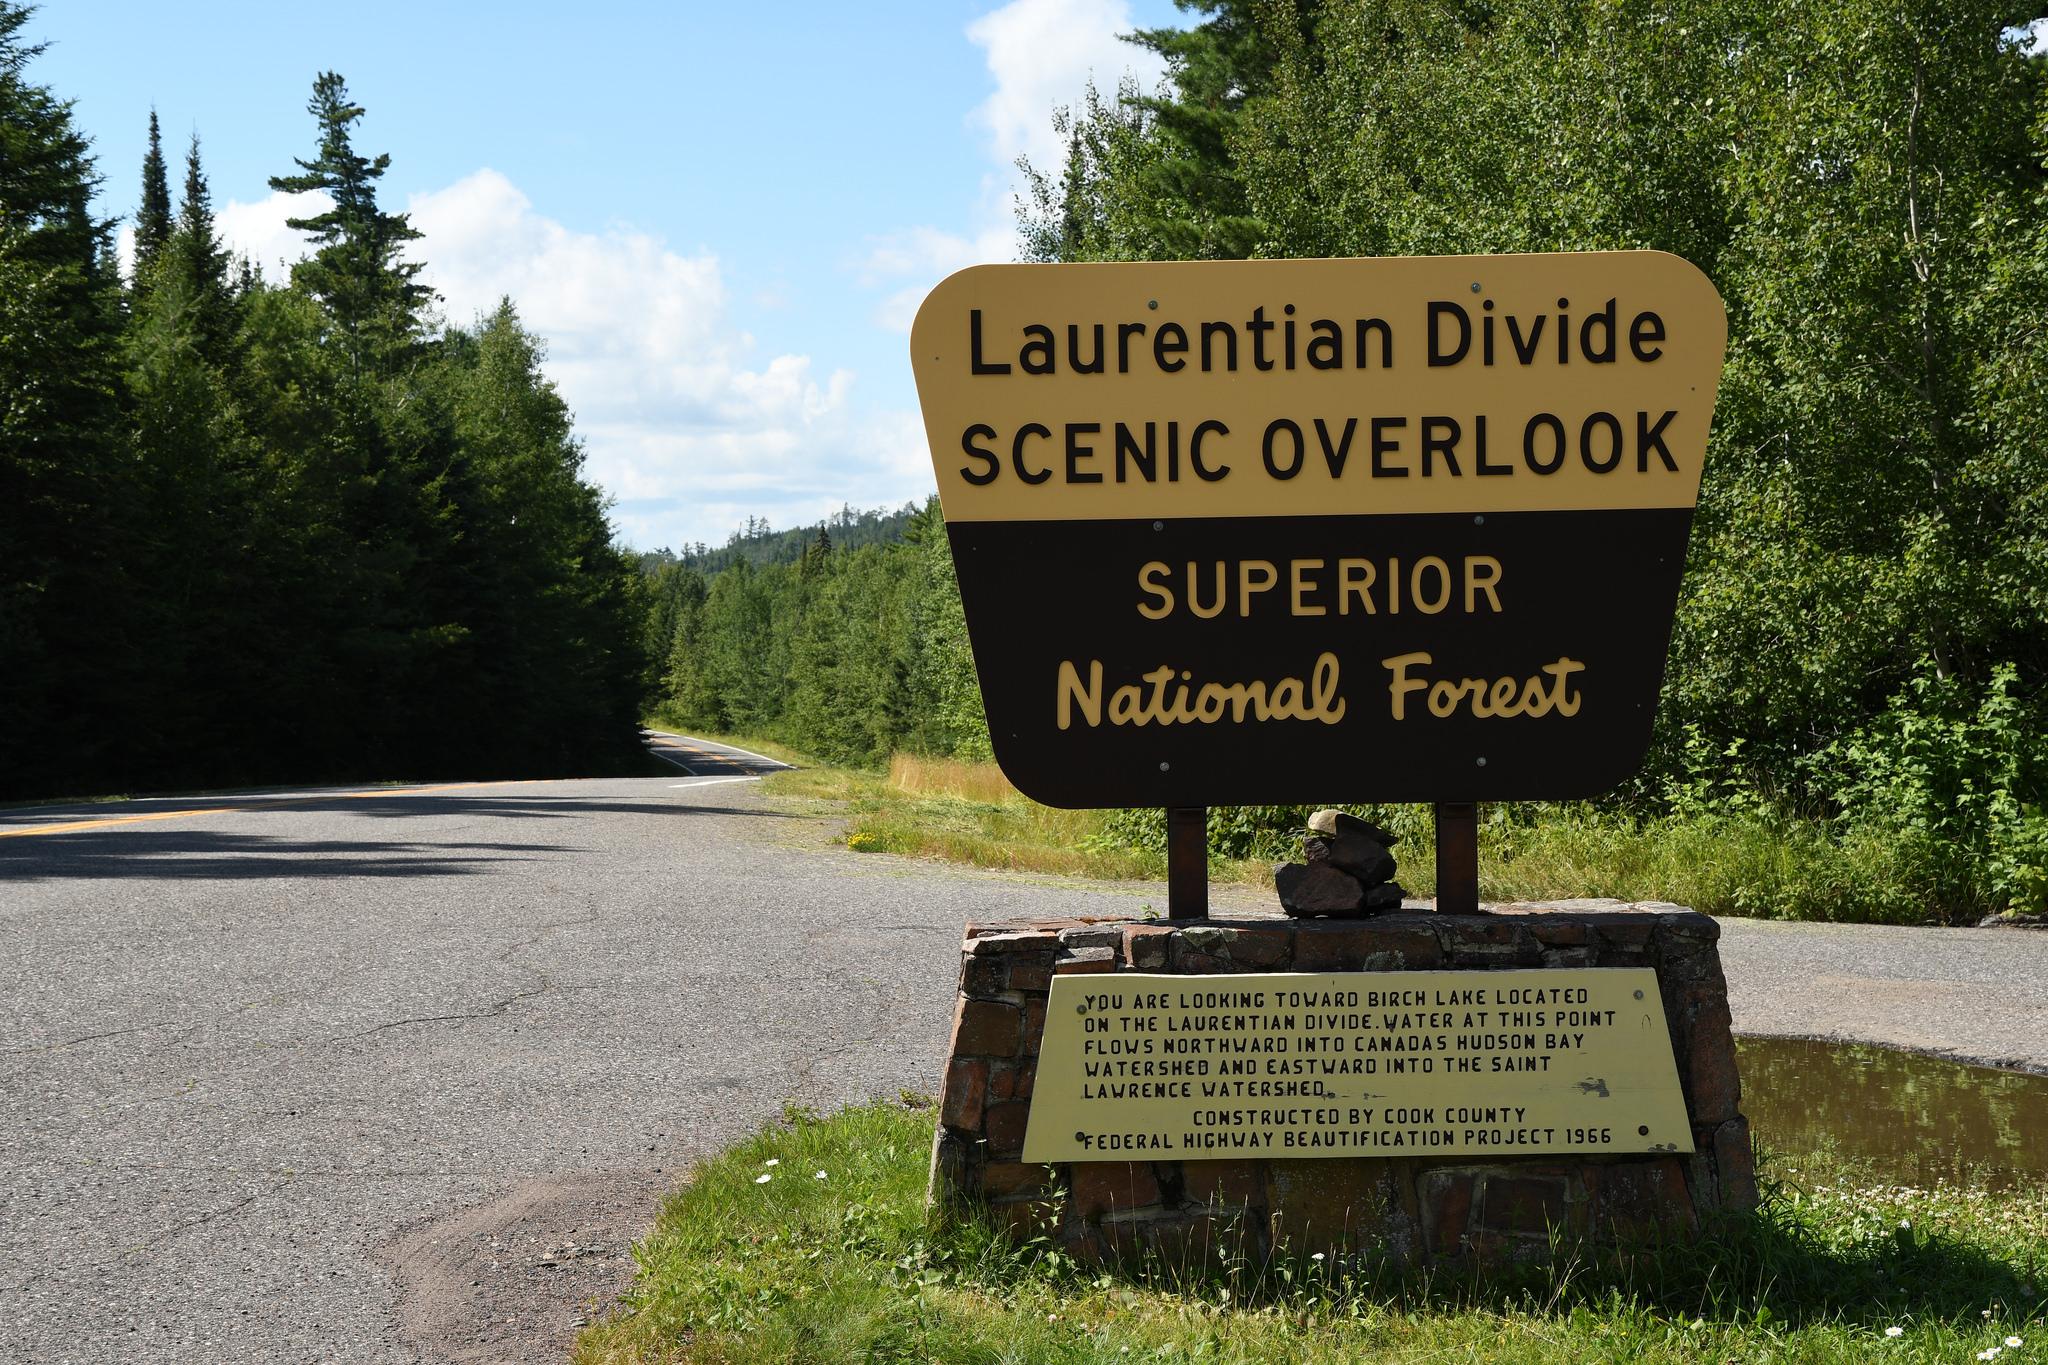 Laurentian Divide